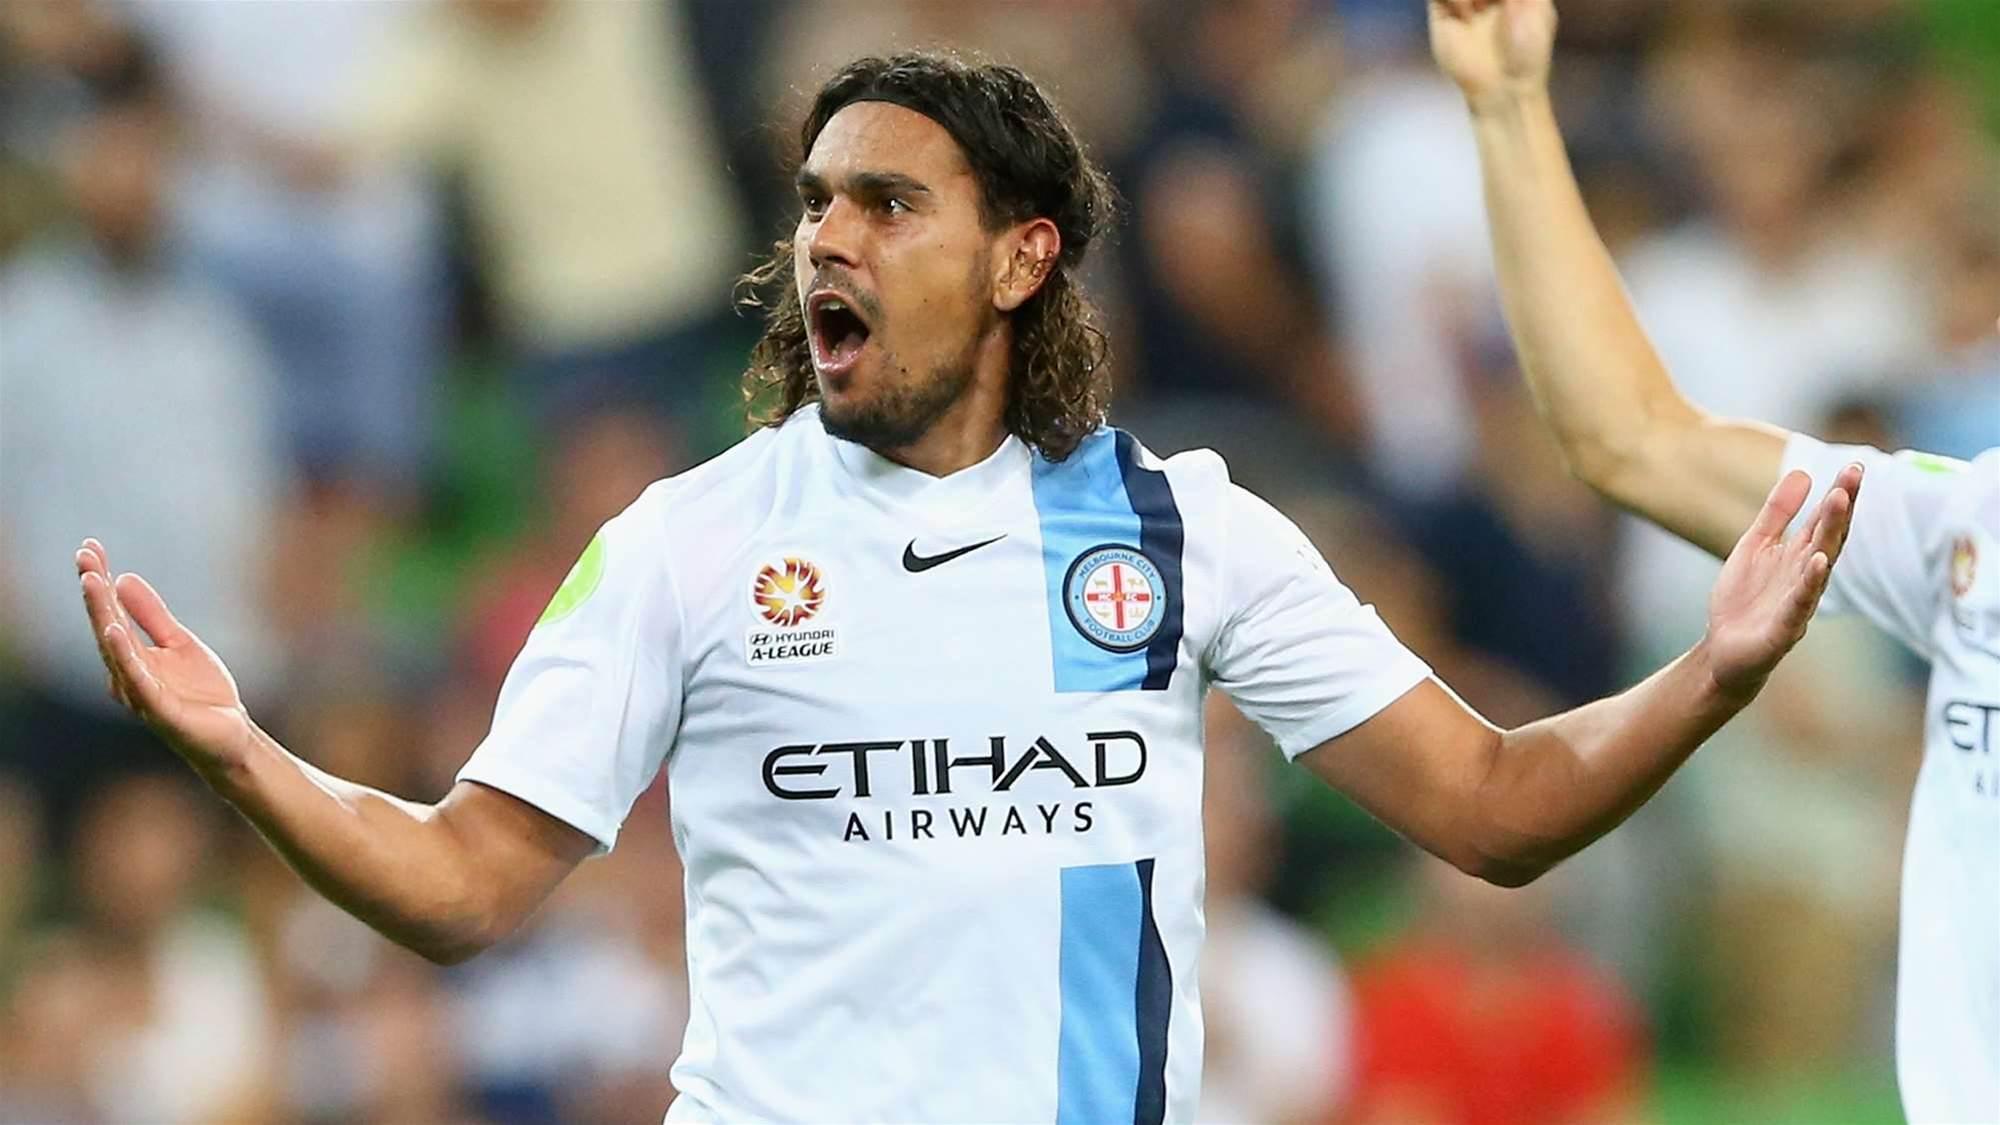 Williams backs City to shine